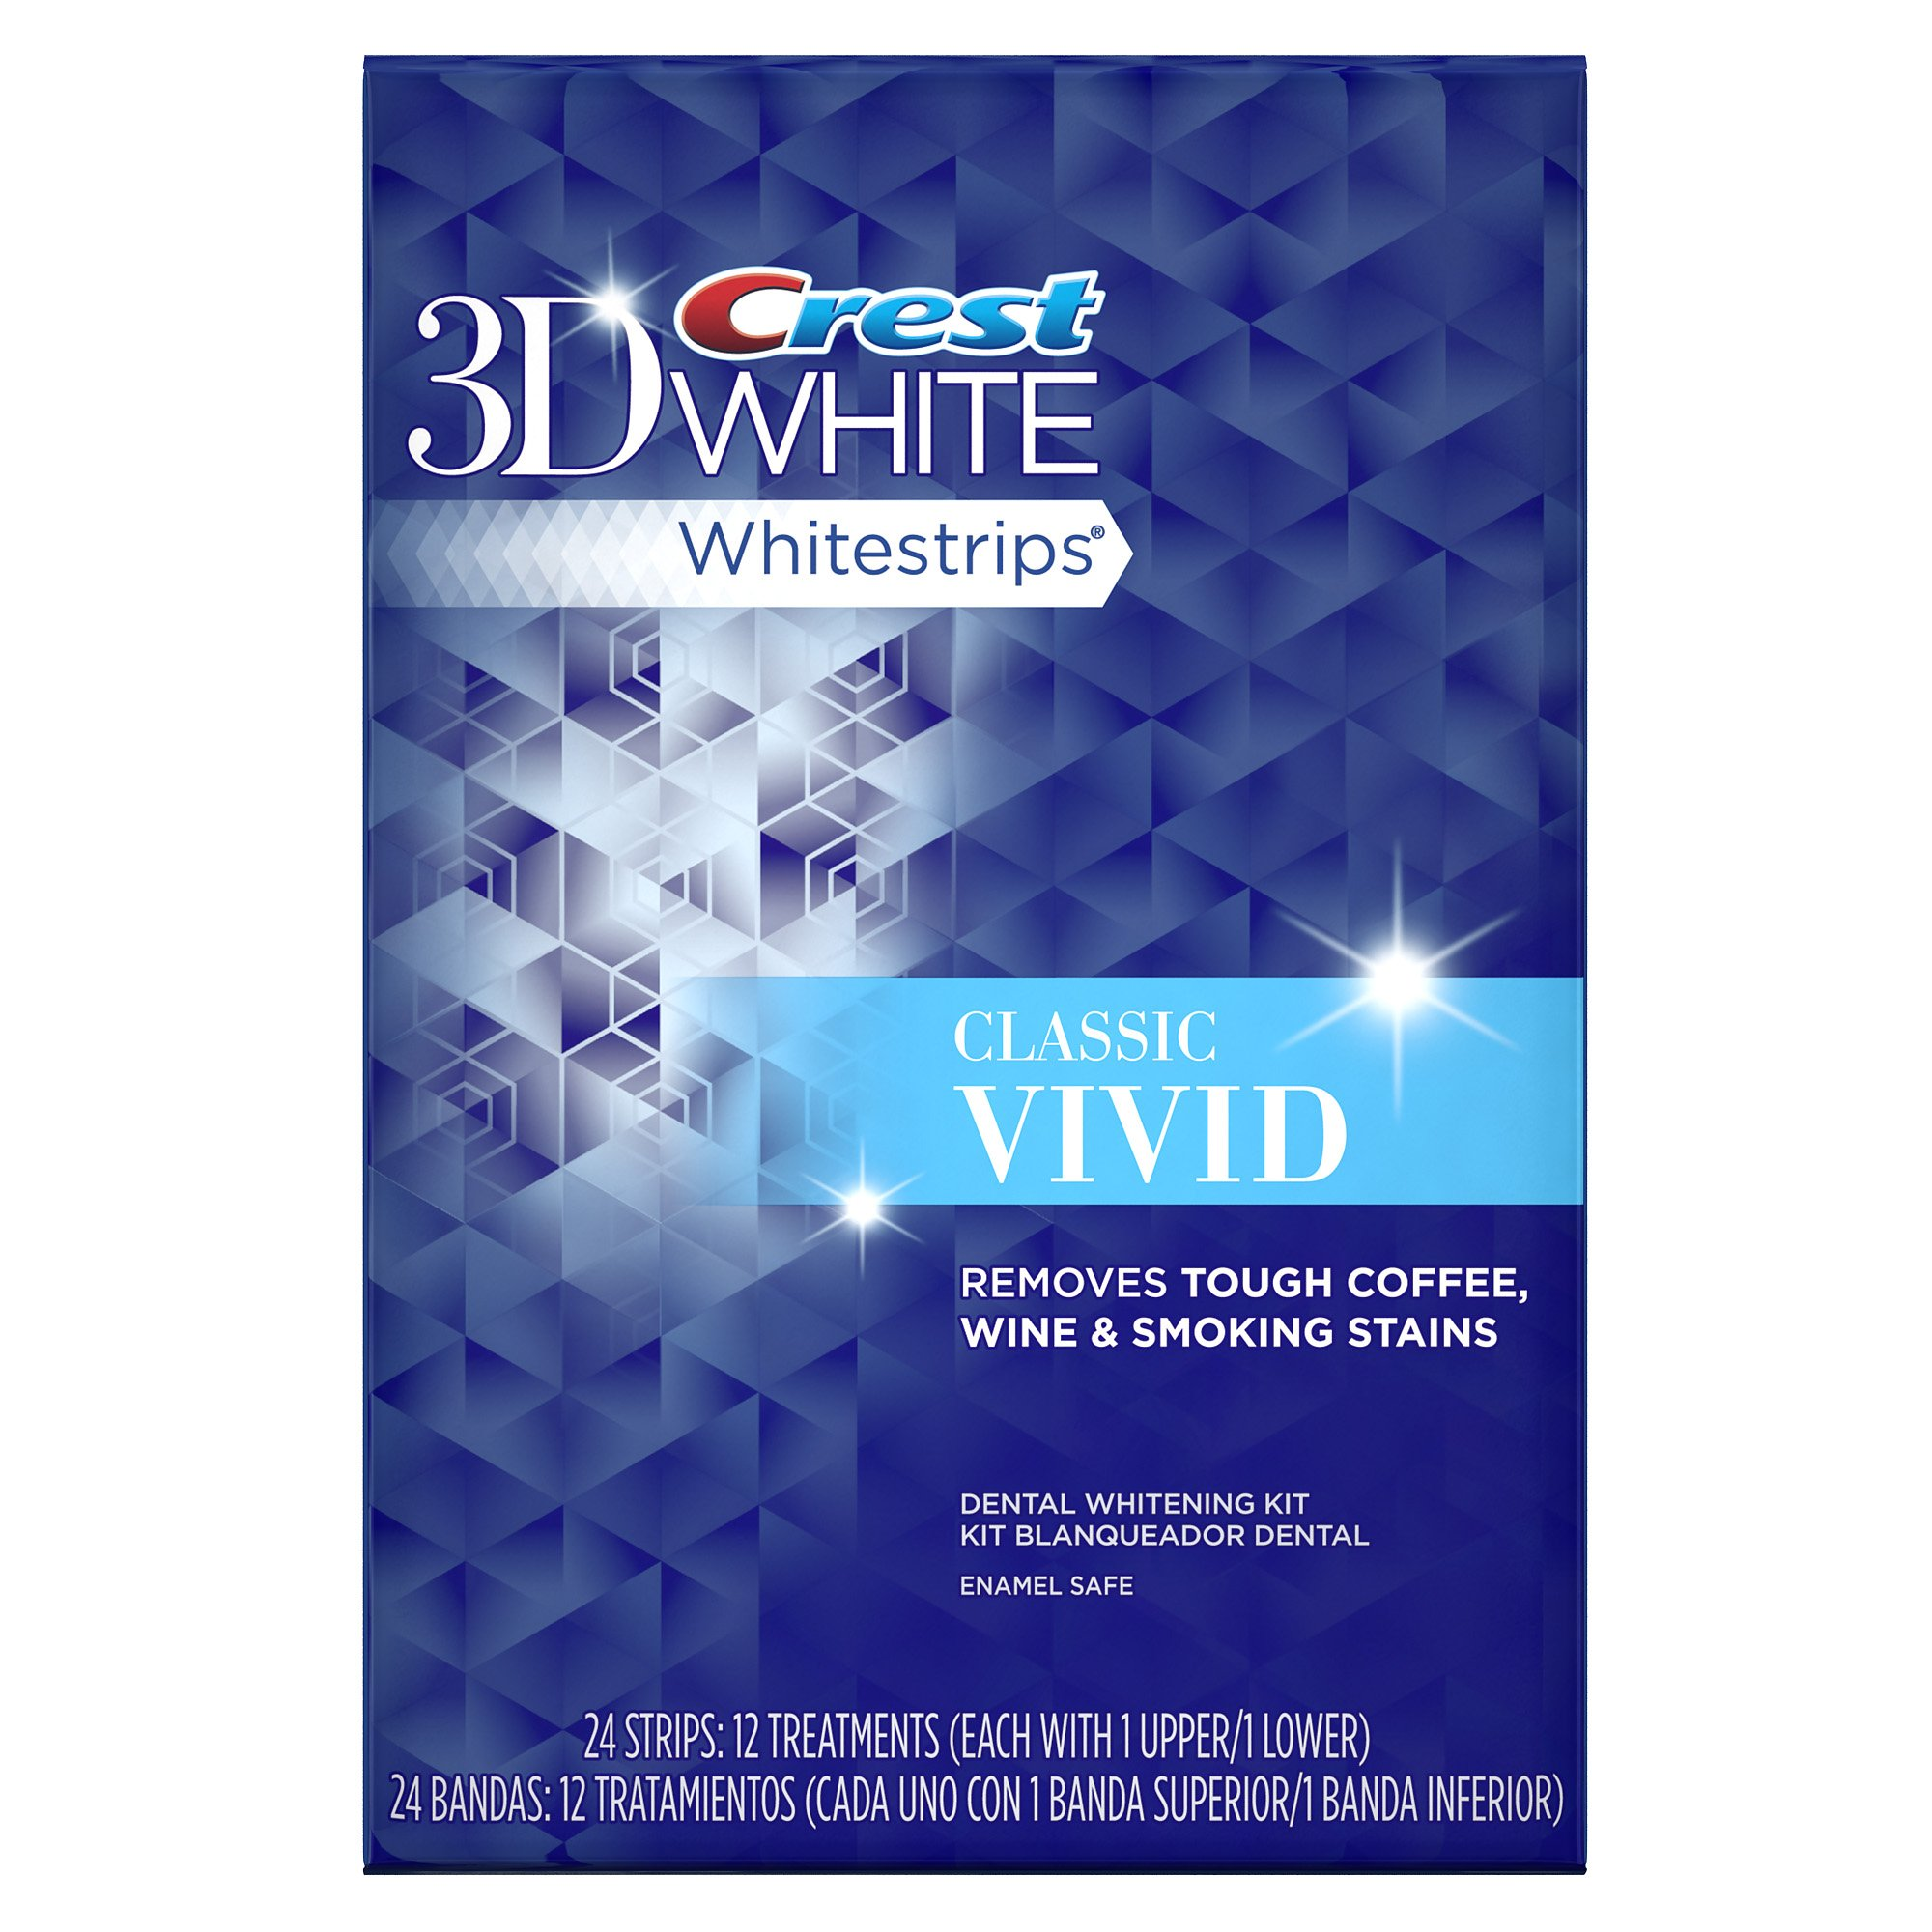 Crest 3D White Whitestrips Classic Vivid Teeth Whitening Kit, 12 Treatments - 24 Strips